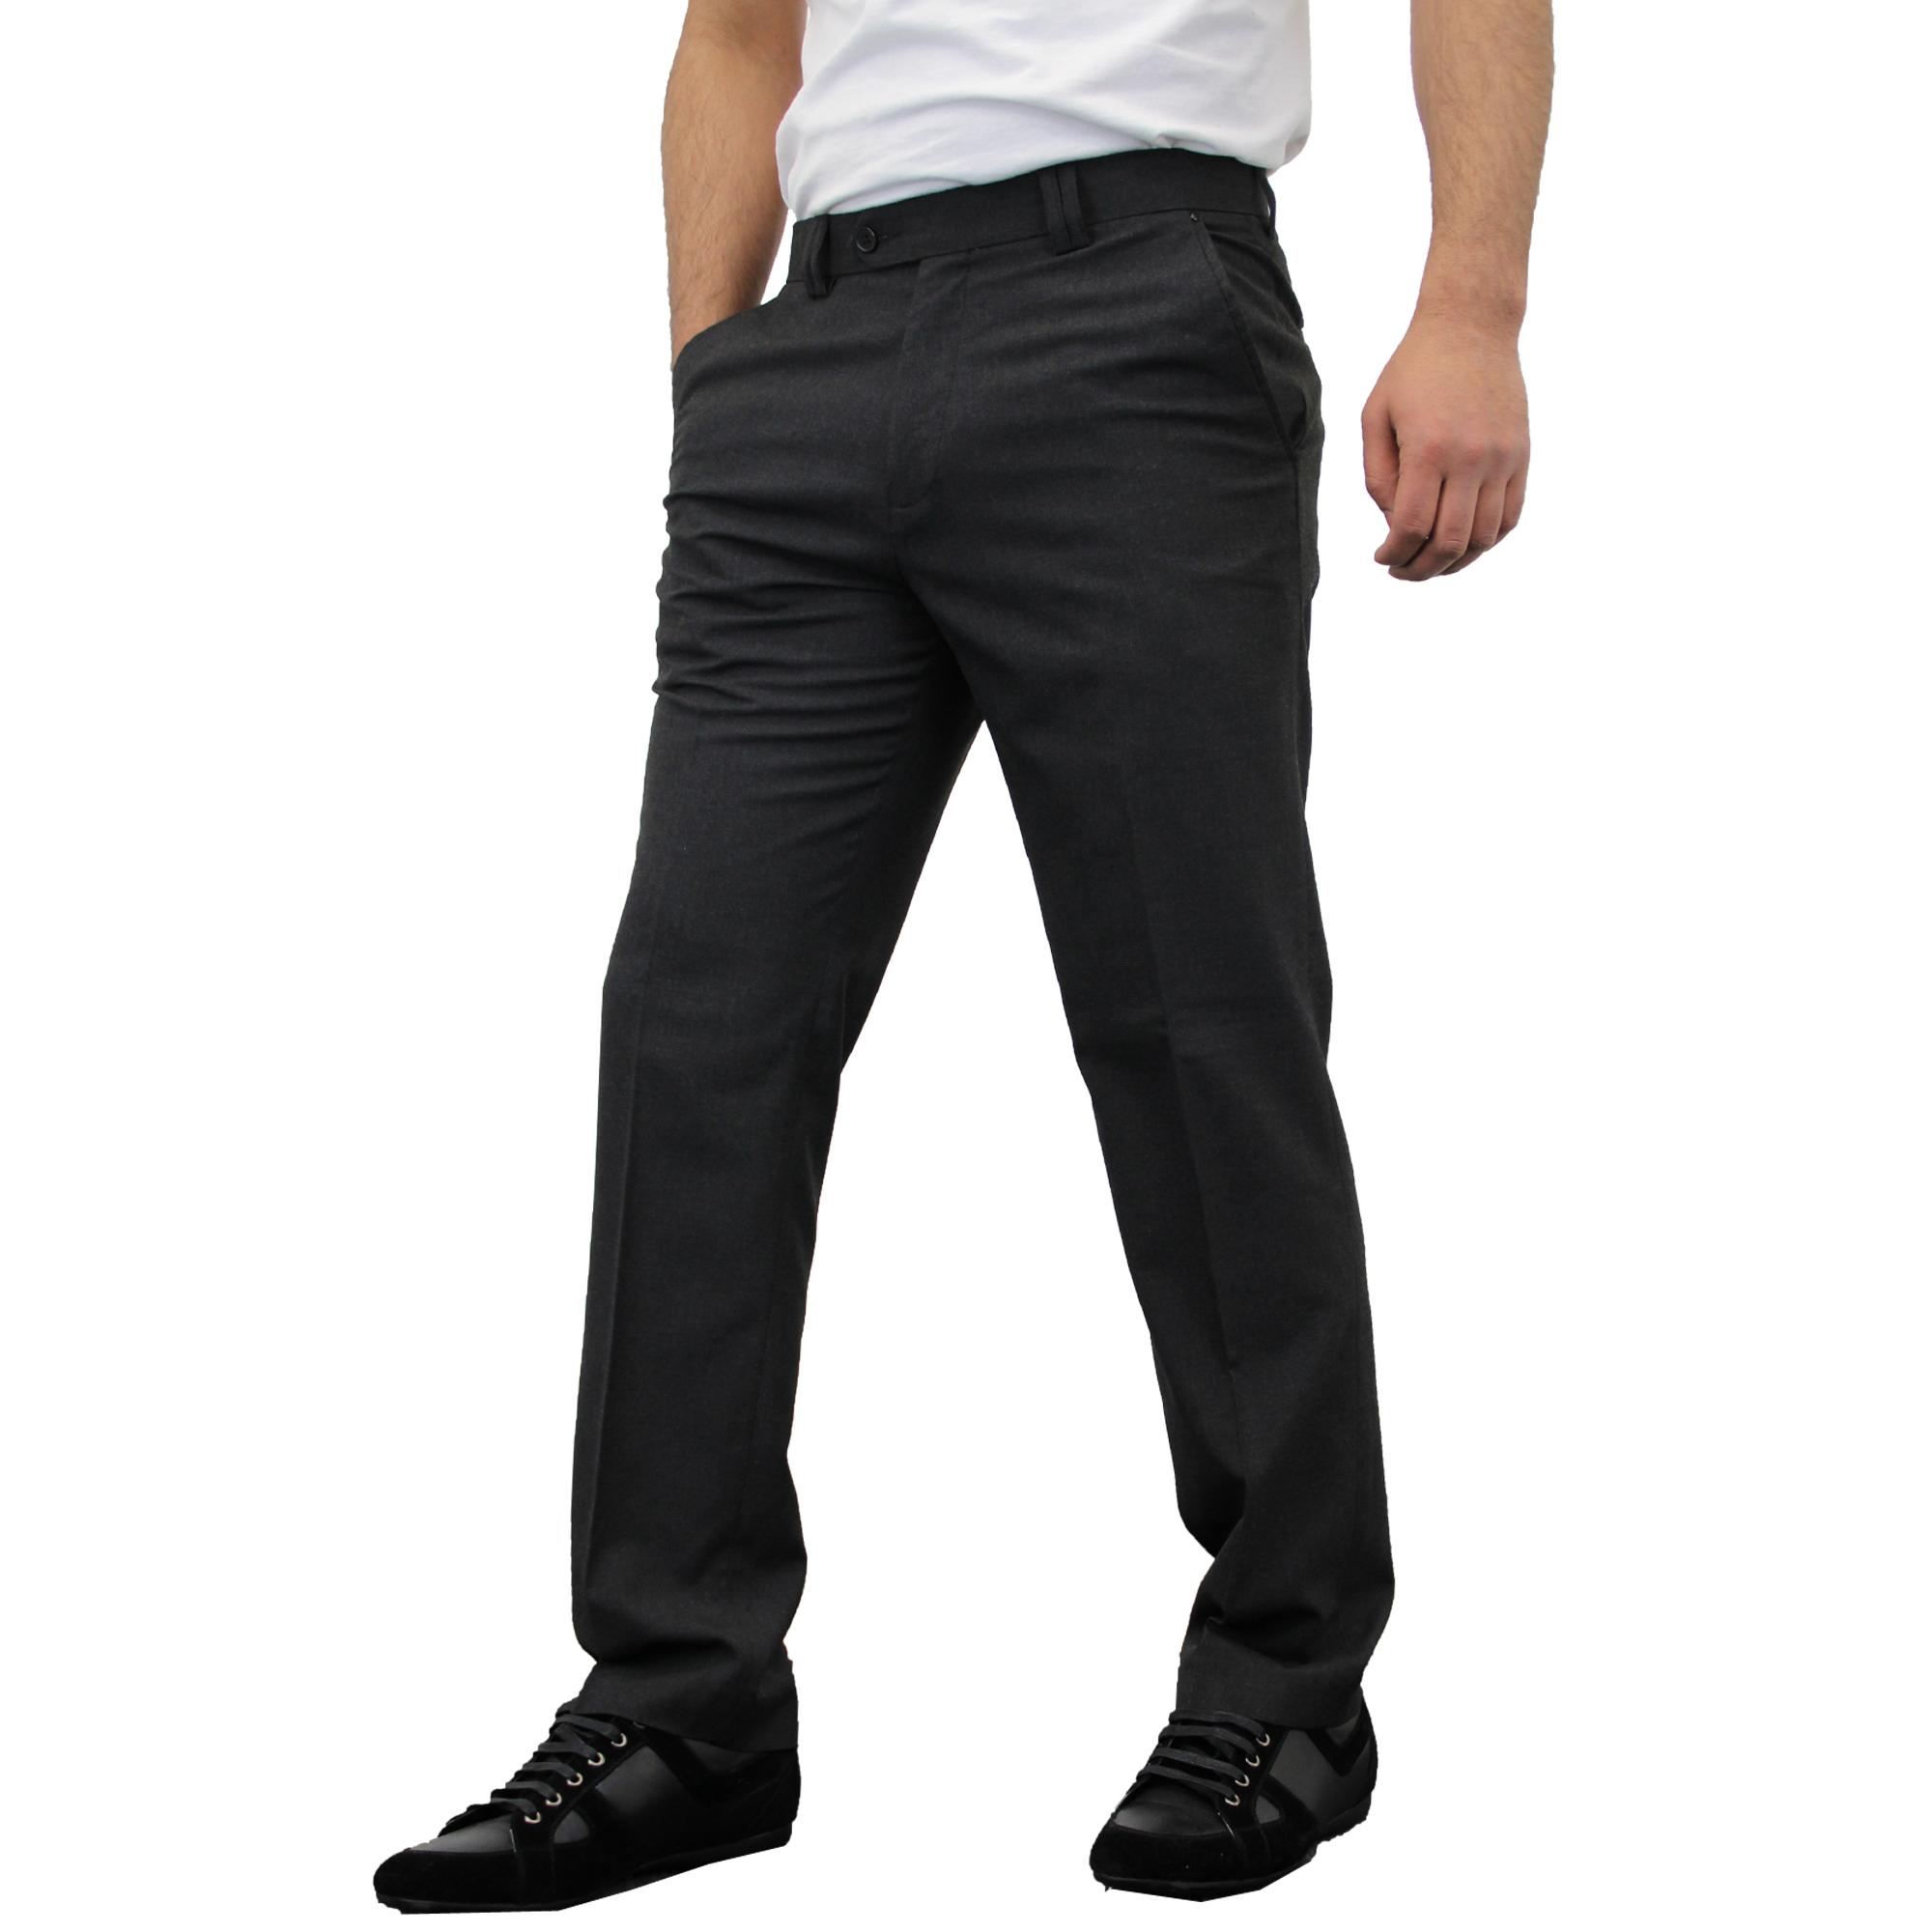 Matrimonio Uomo Jeans : Pantalone uomo soul london abiti da cerimonia lavoro d